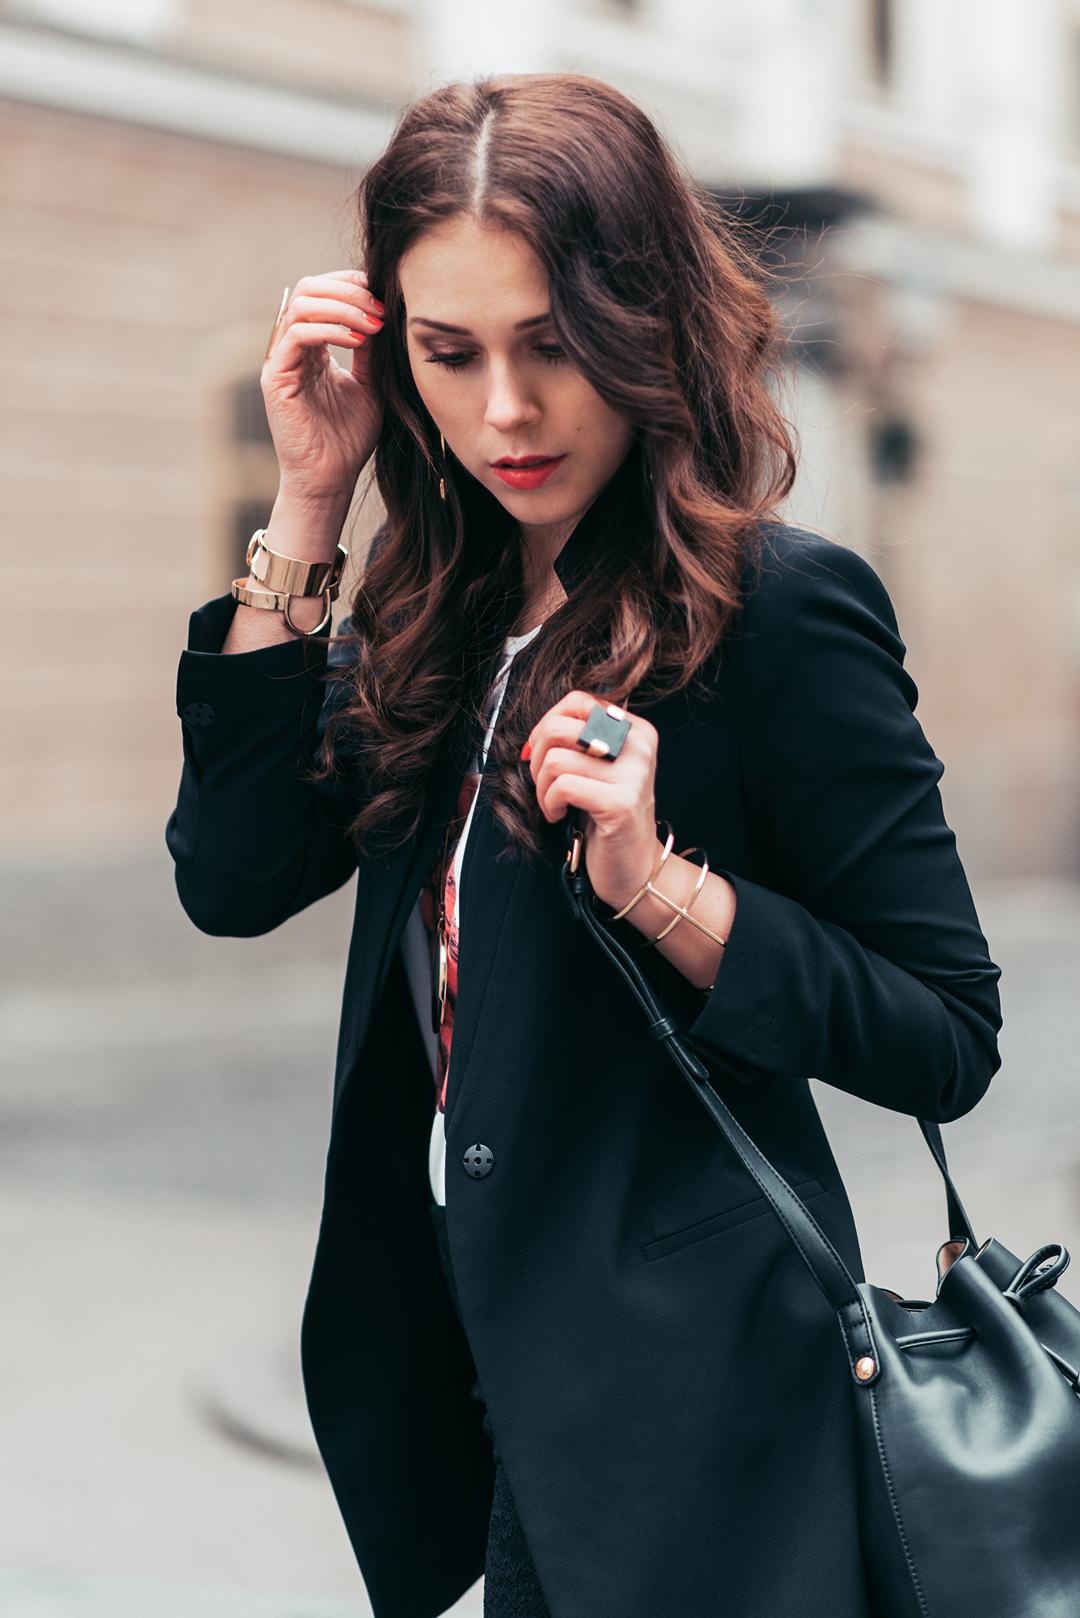 eva-ahacevcic_love-eva_ootd_six-accessories_zara-skirt_blazer_parfois-shoes_style_fashion-4